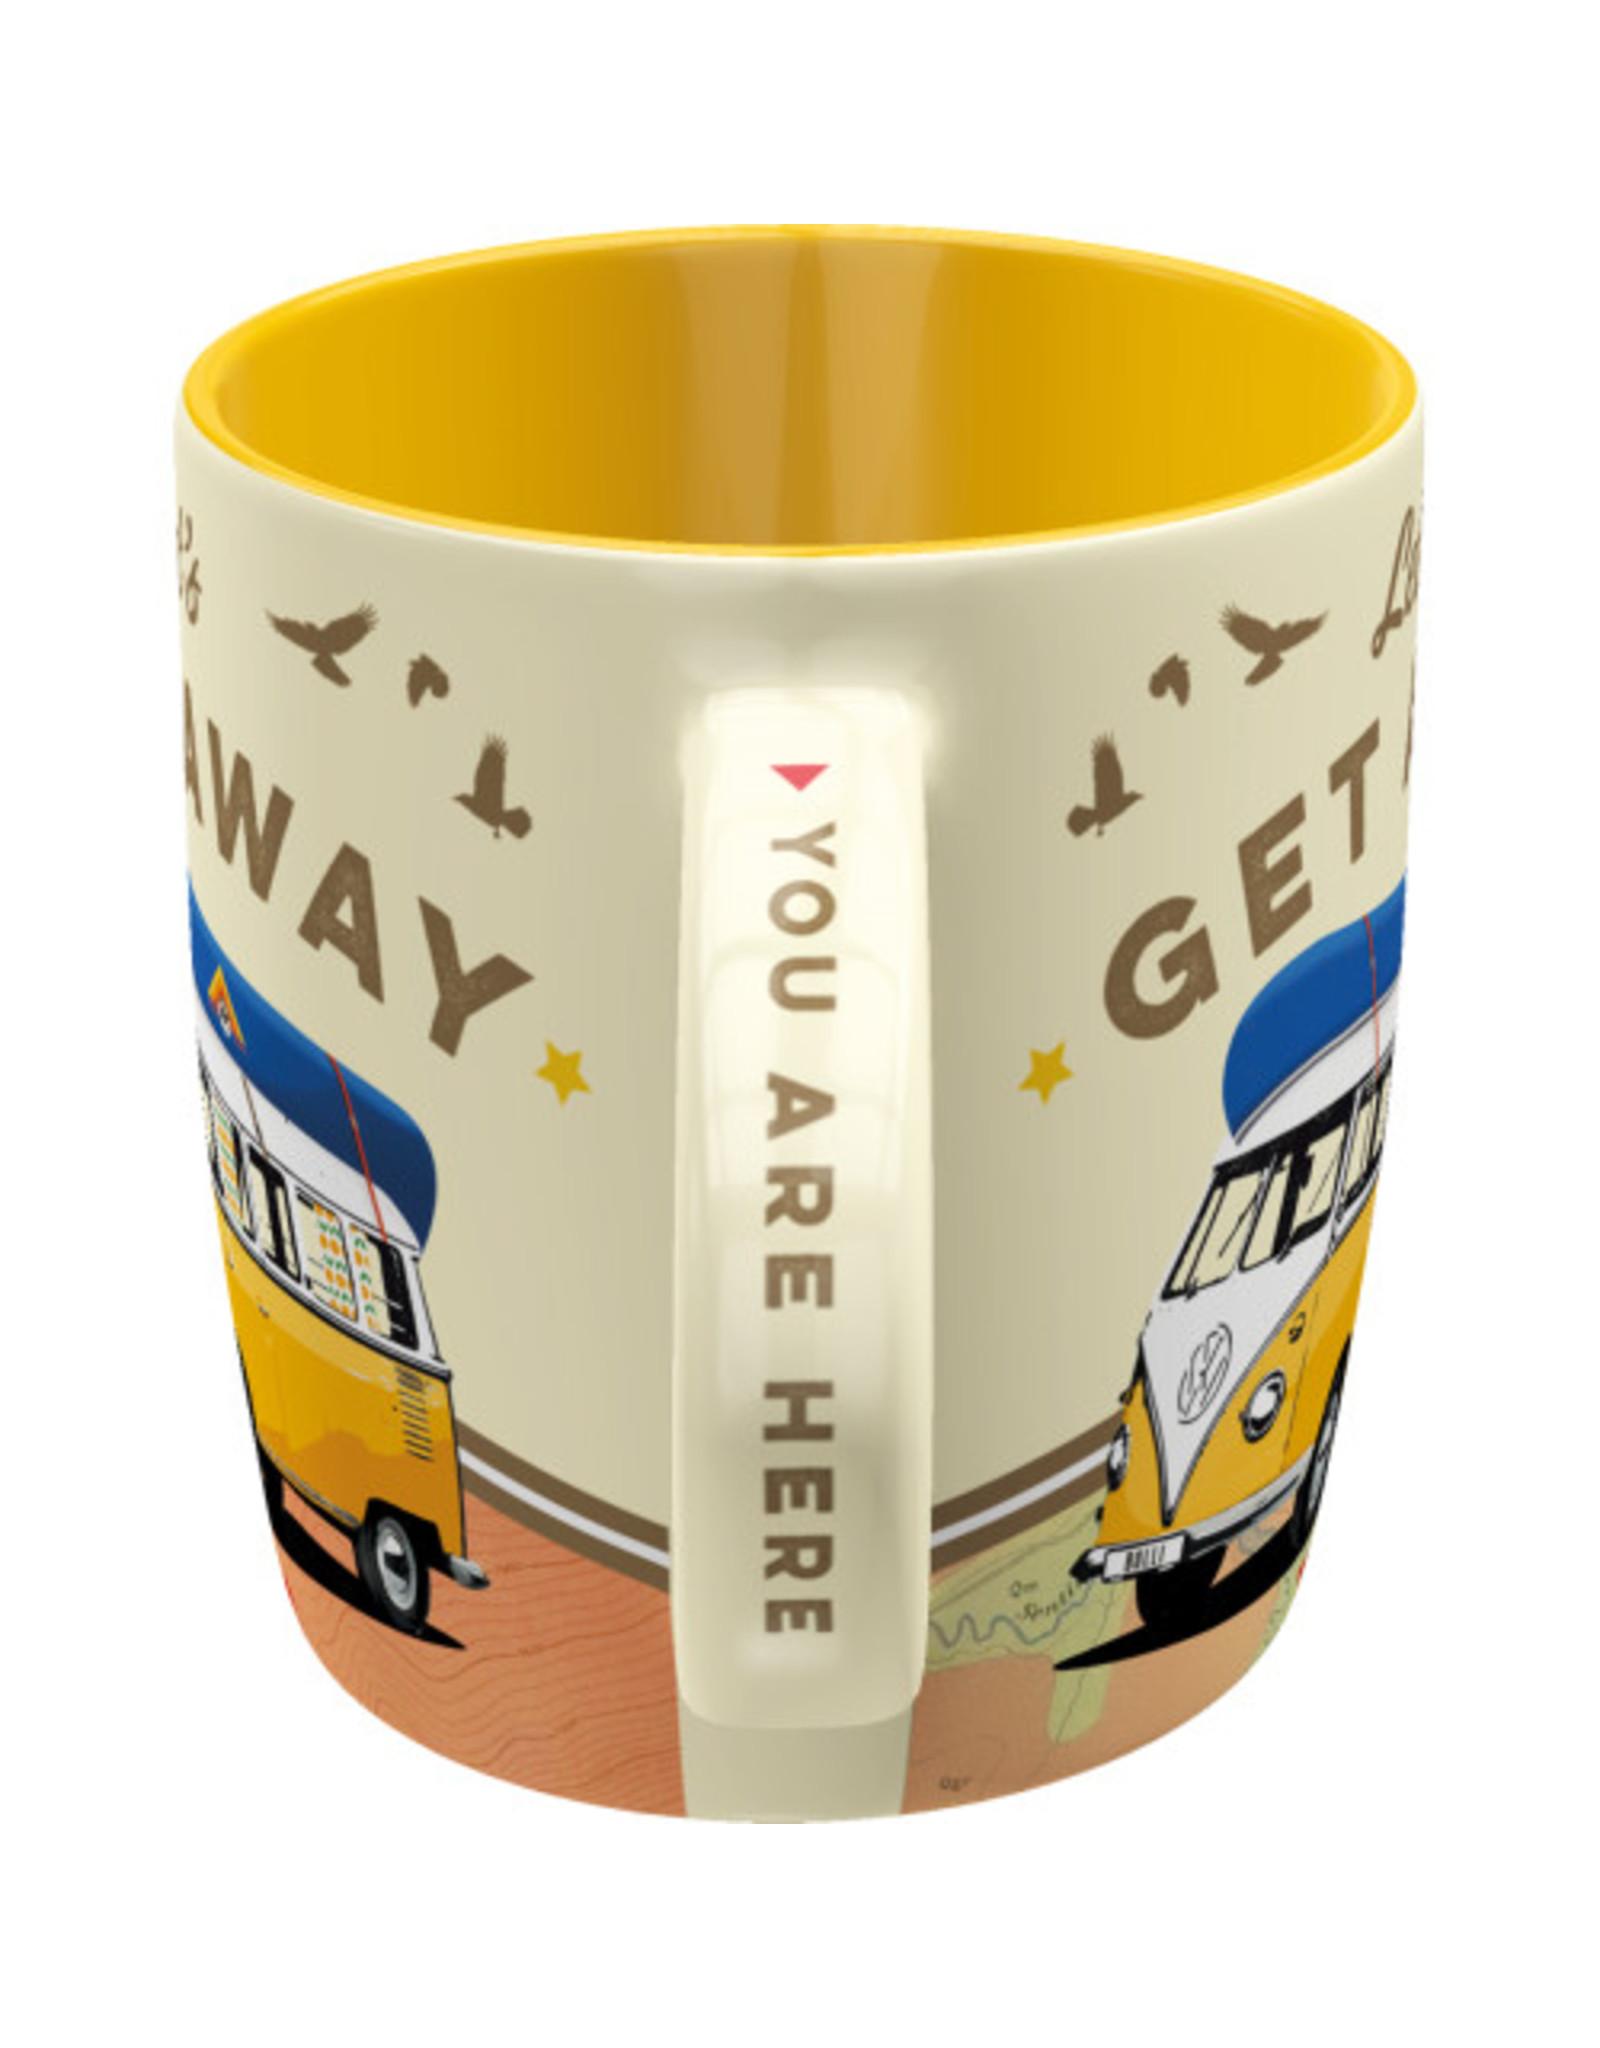 mug - let's get away